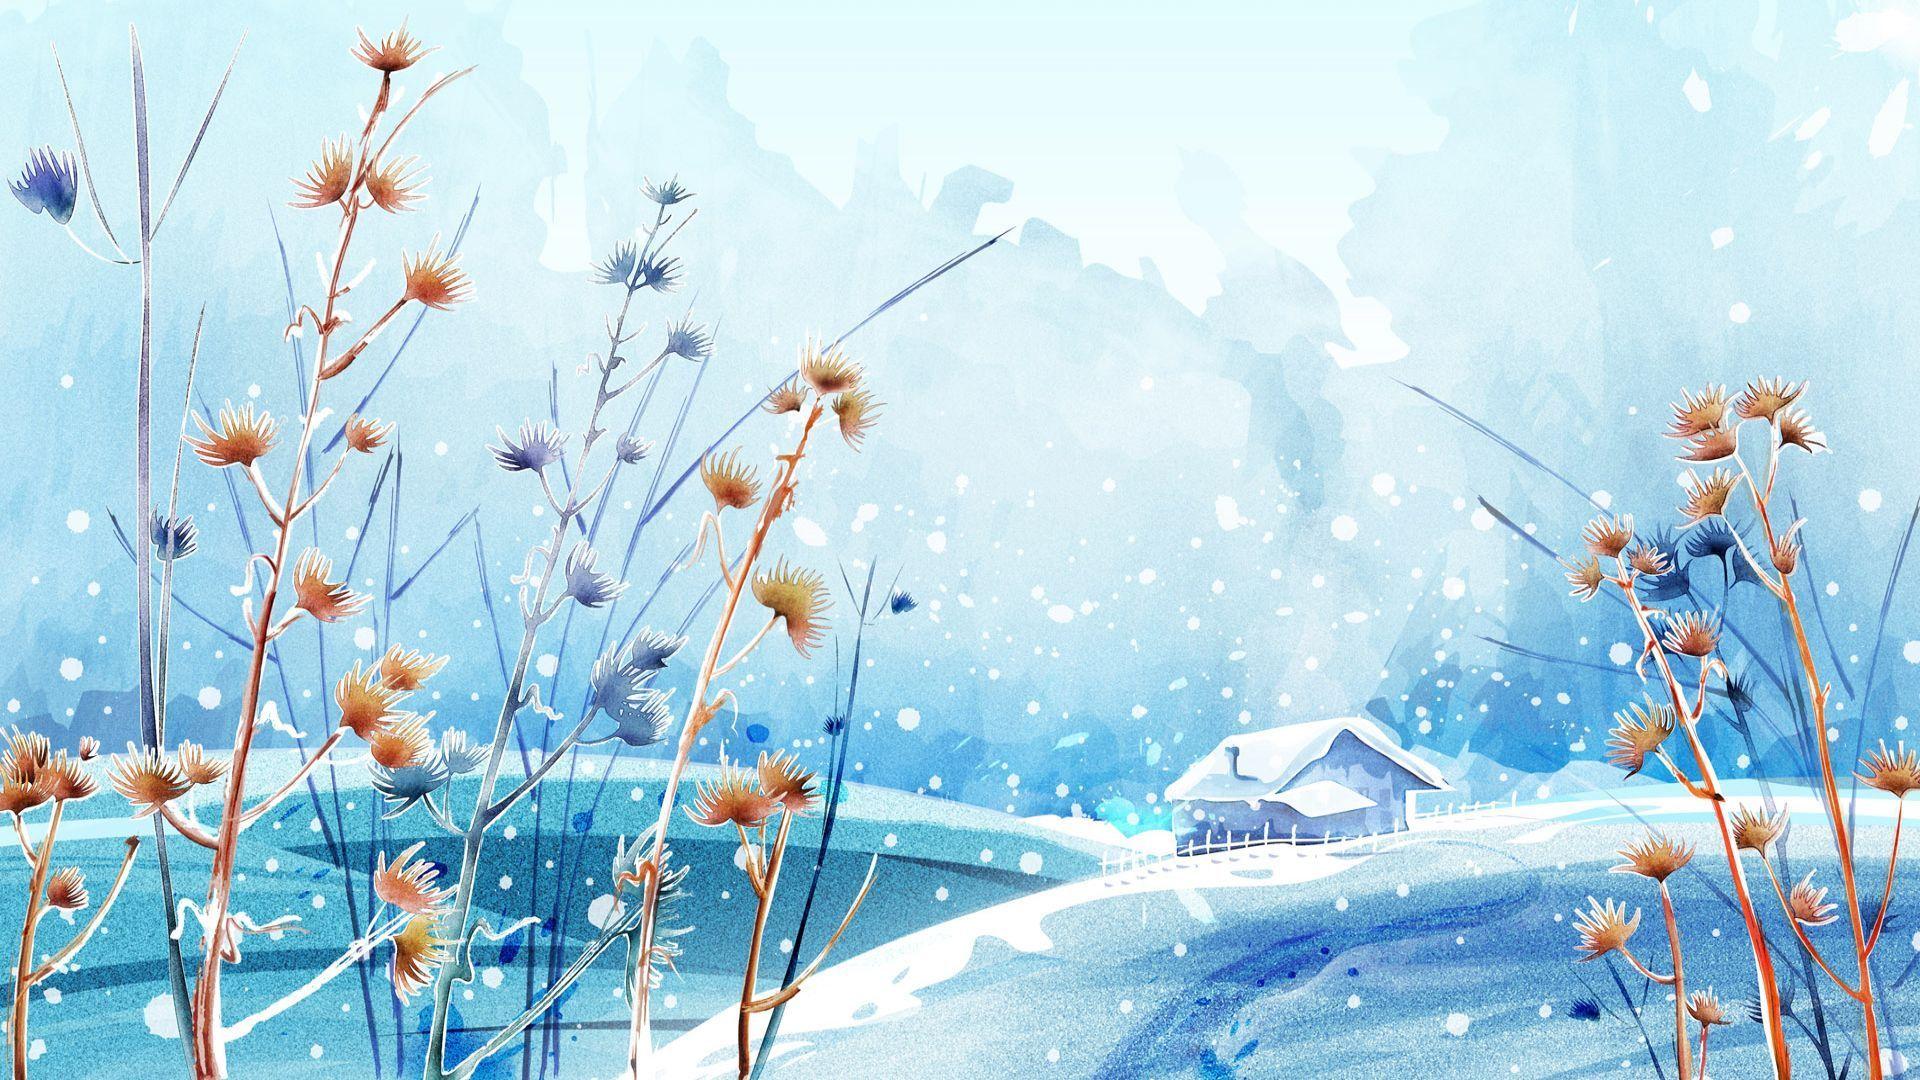 Anime Winter Scenery Wallpaper Find best latest Anime